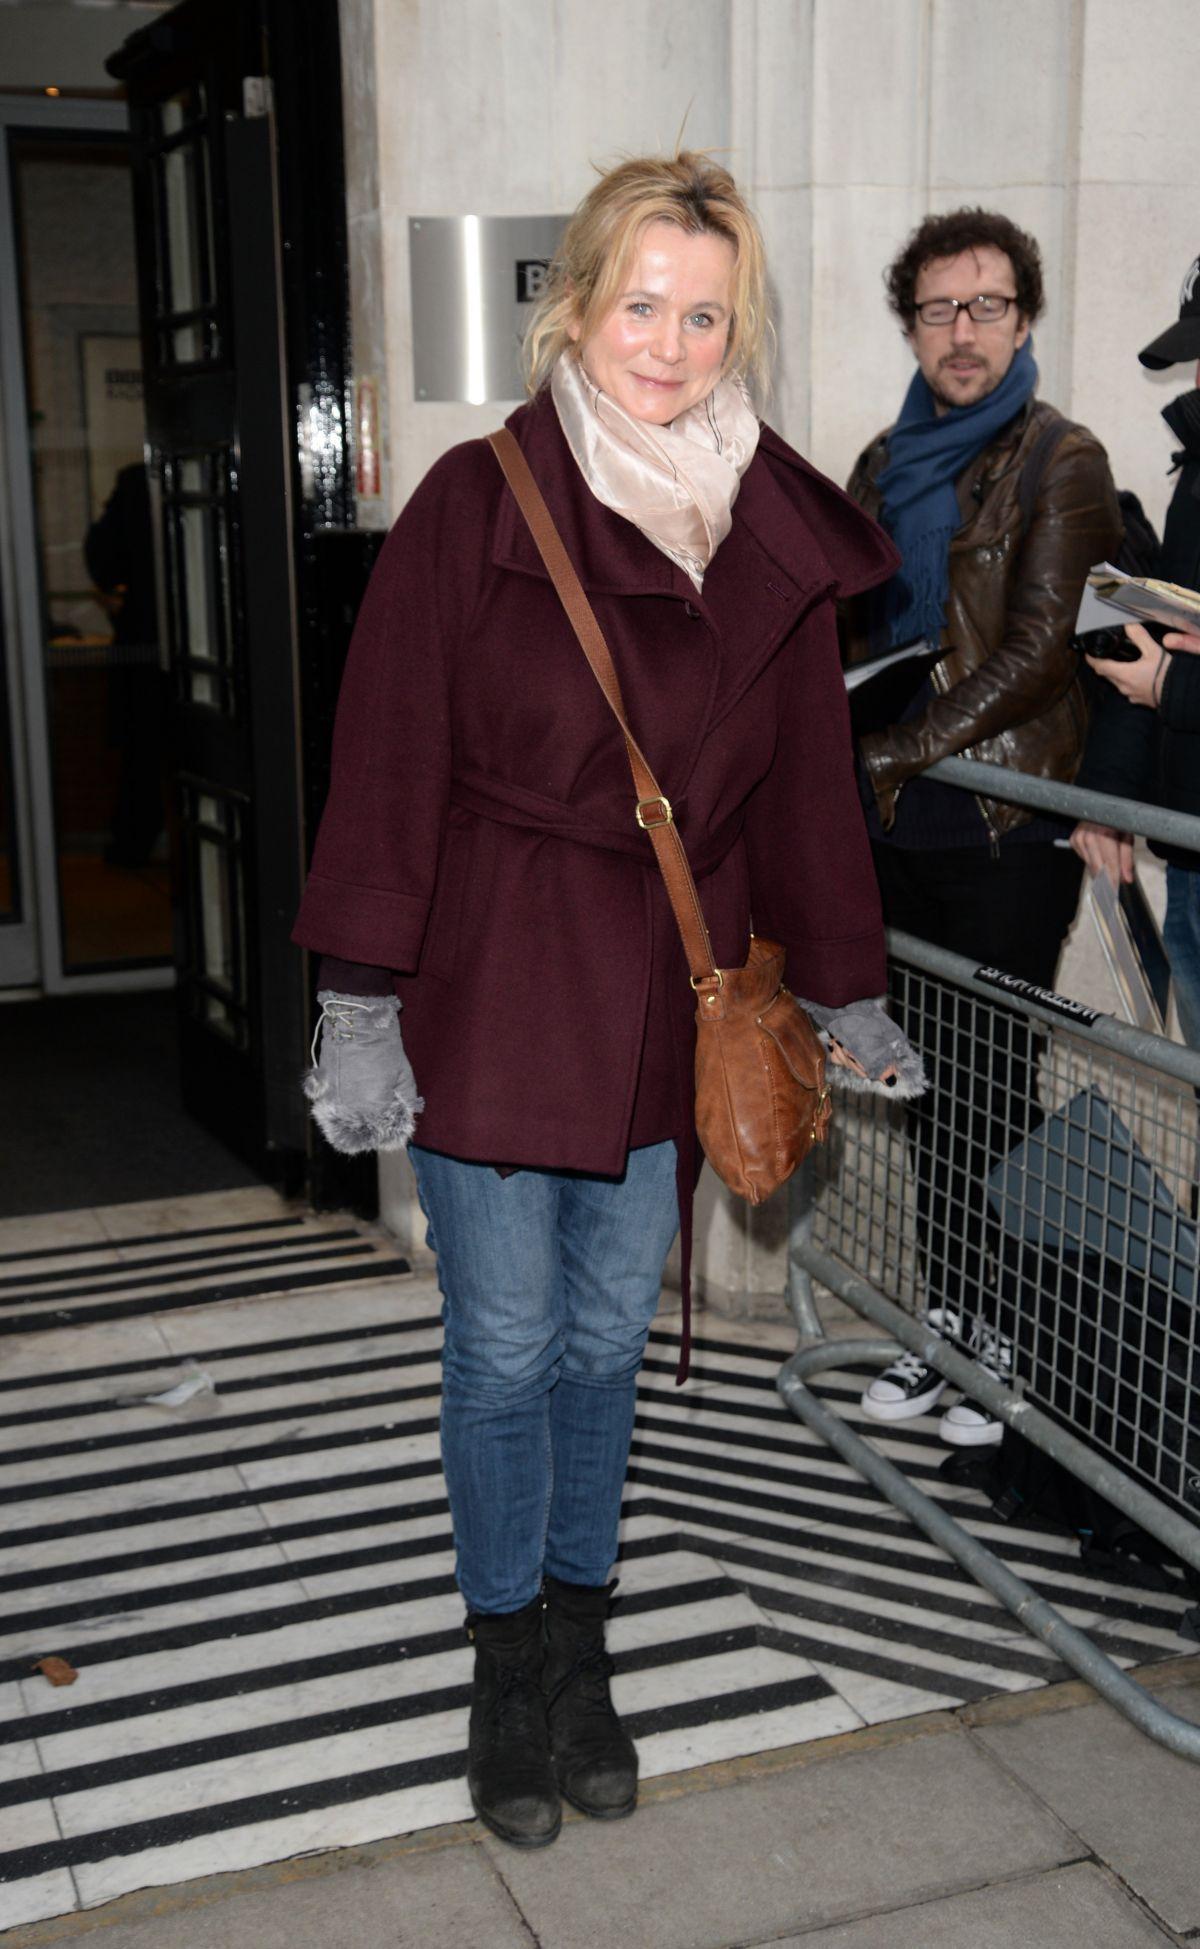 EMILY WATSON at BBC Radio 2 Studios in London 01/13/2017